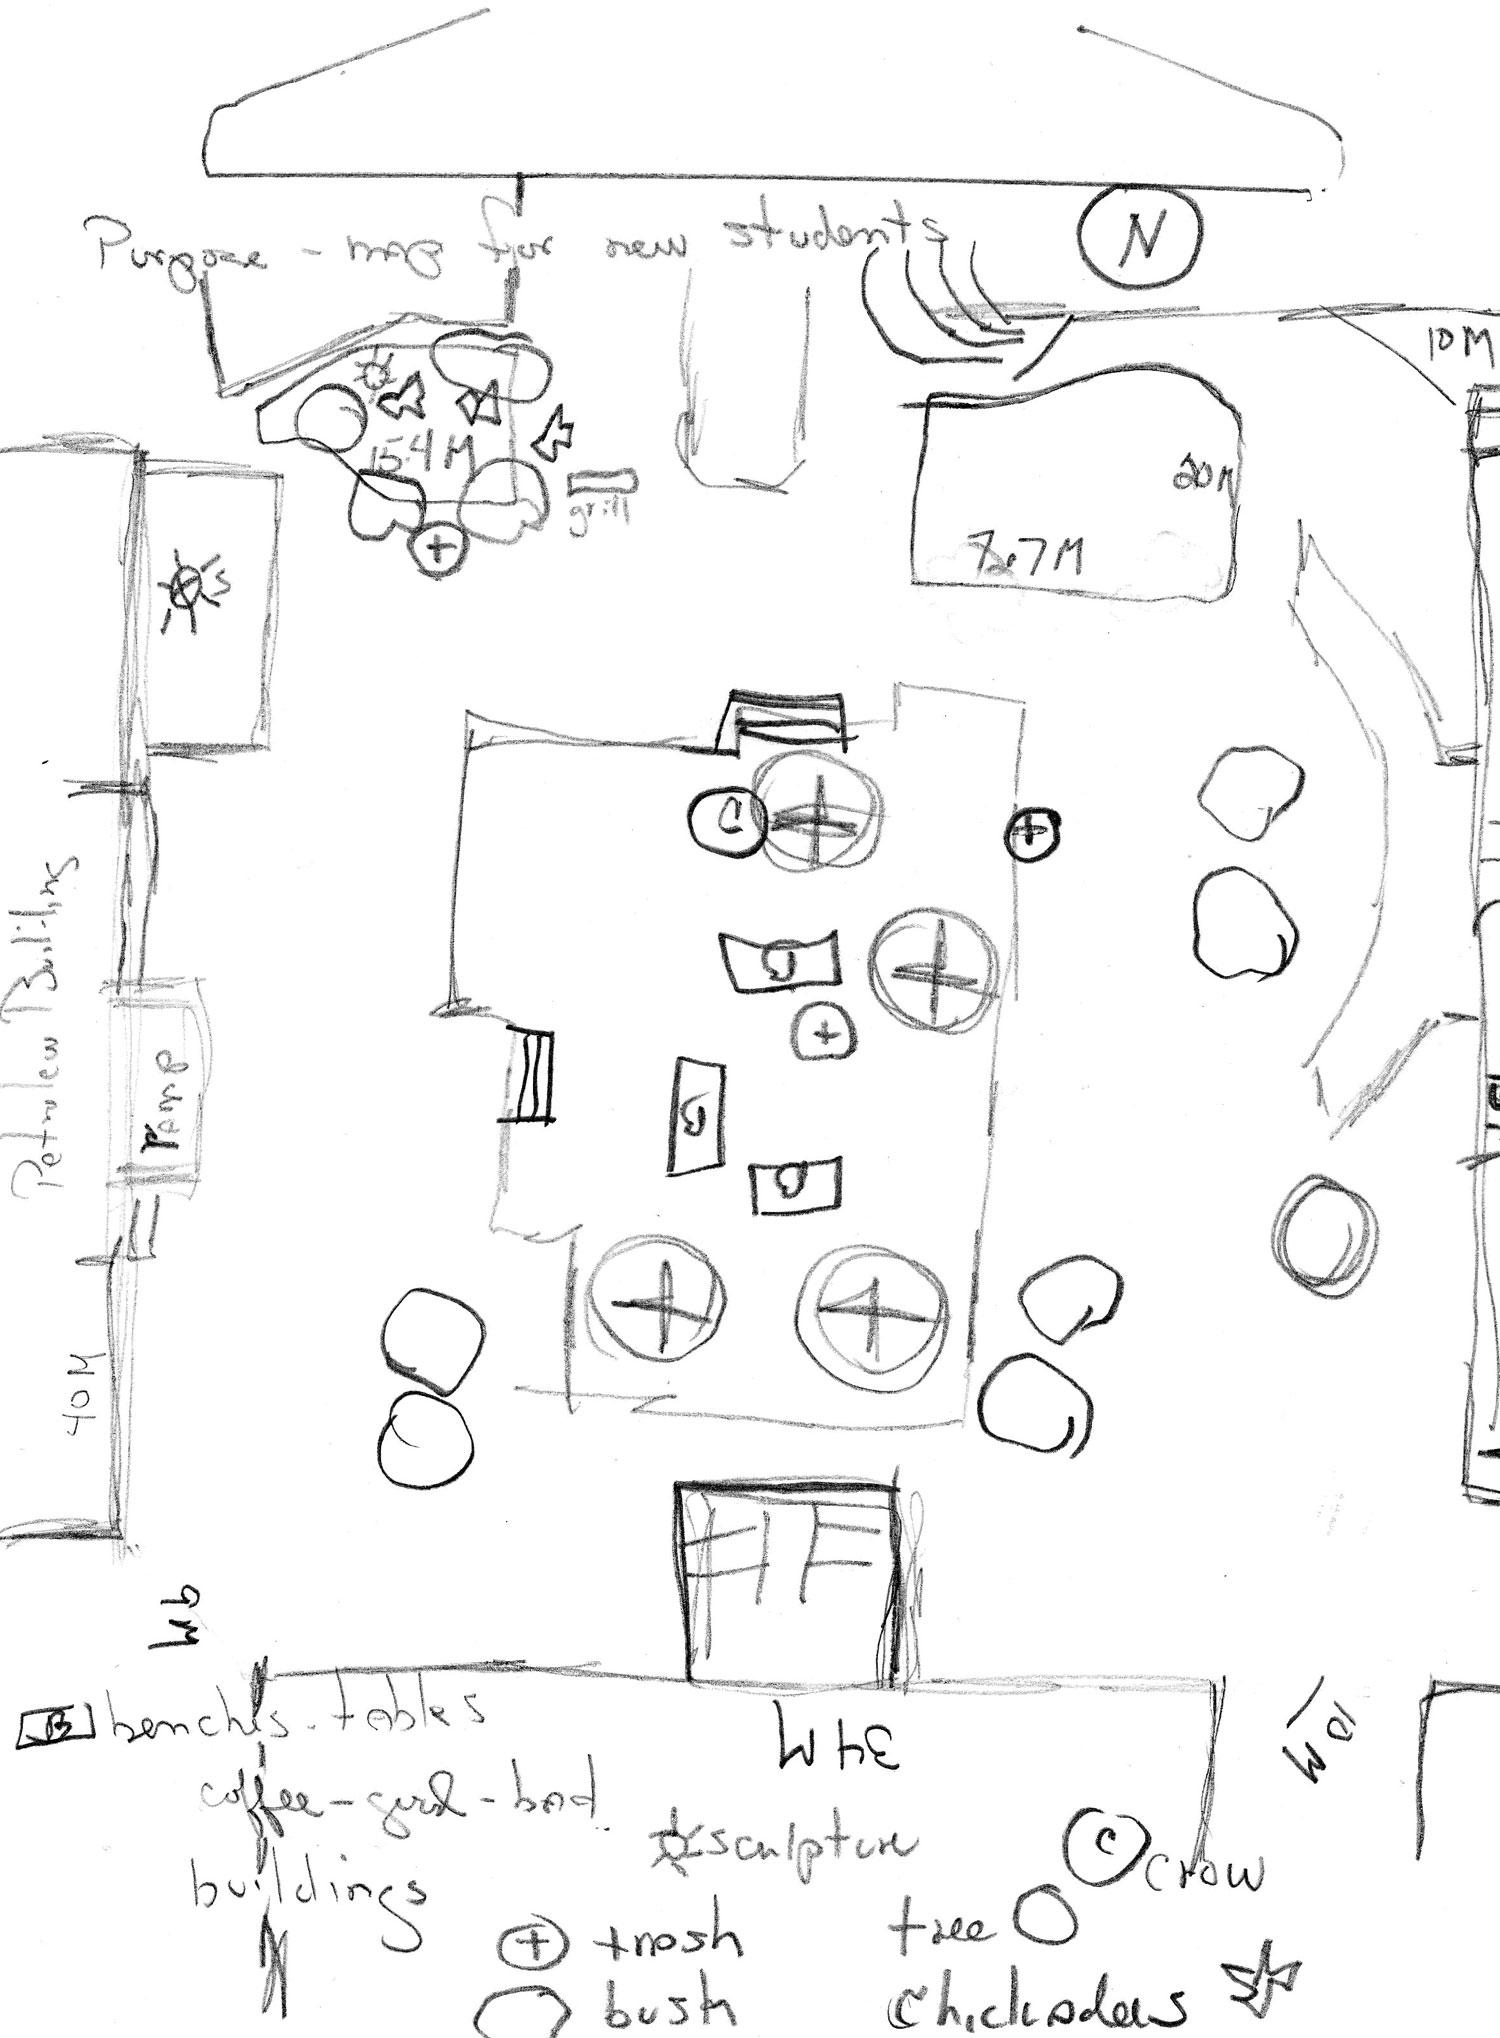 Schoolyard Mapping Activity Montana Science Partnership